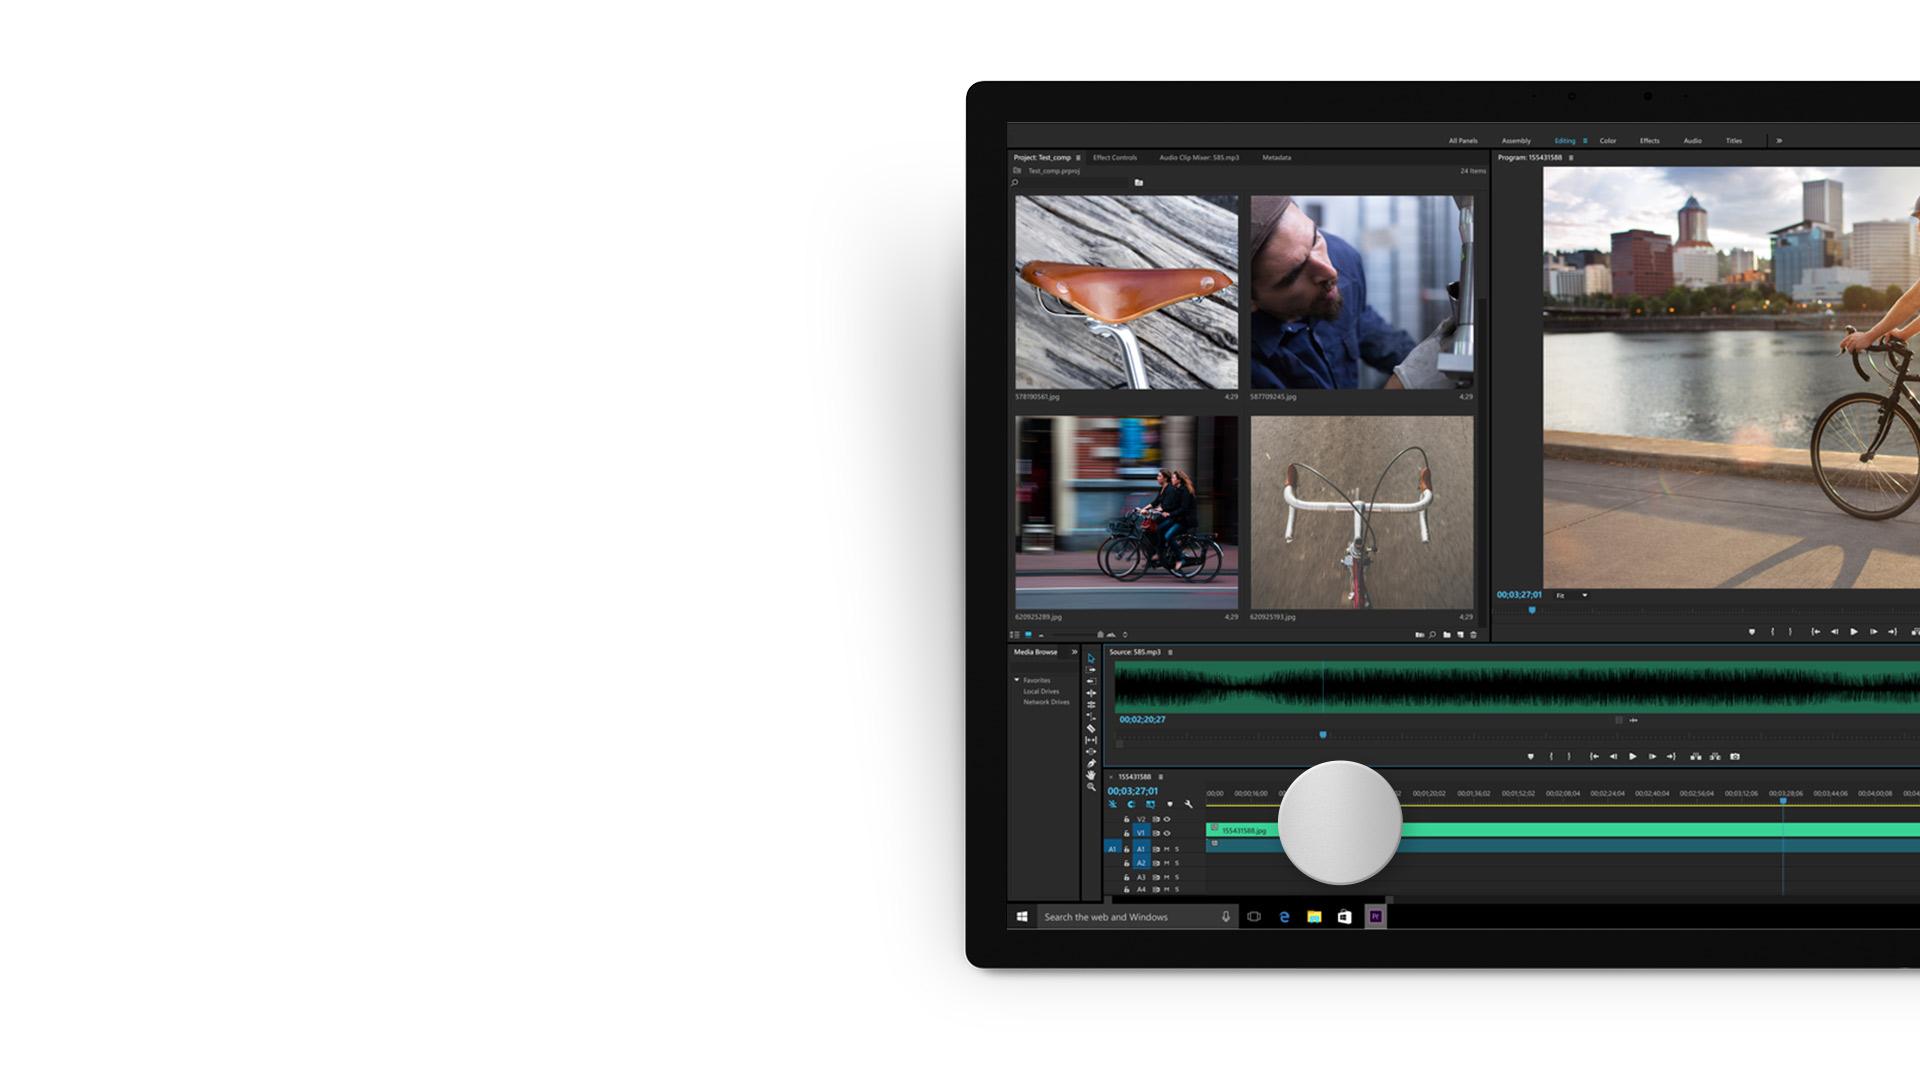 Adobe Premiere Pro CC app on Surface device.